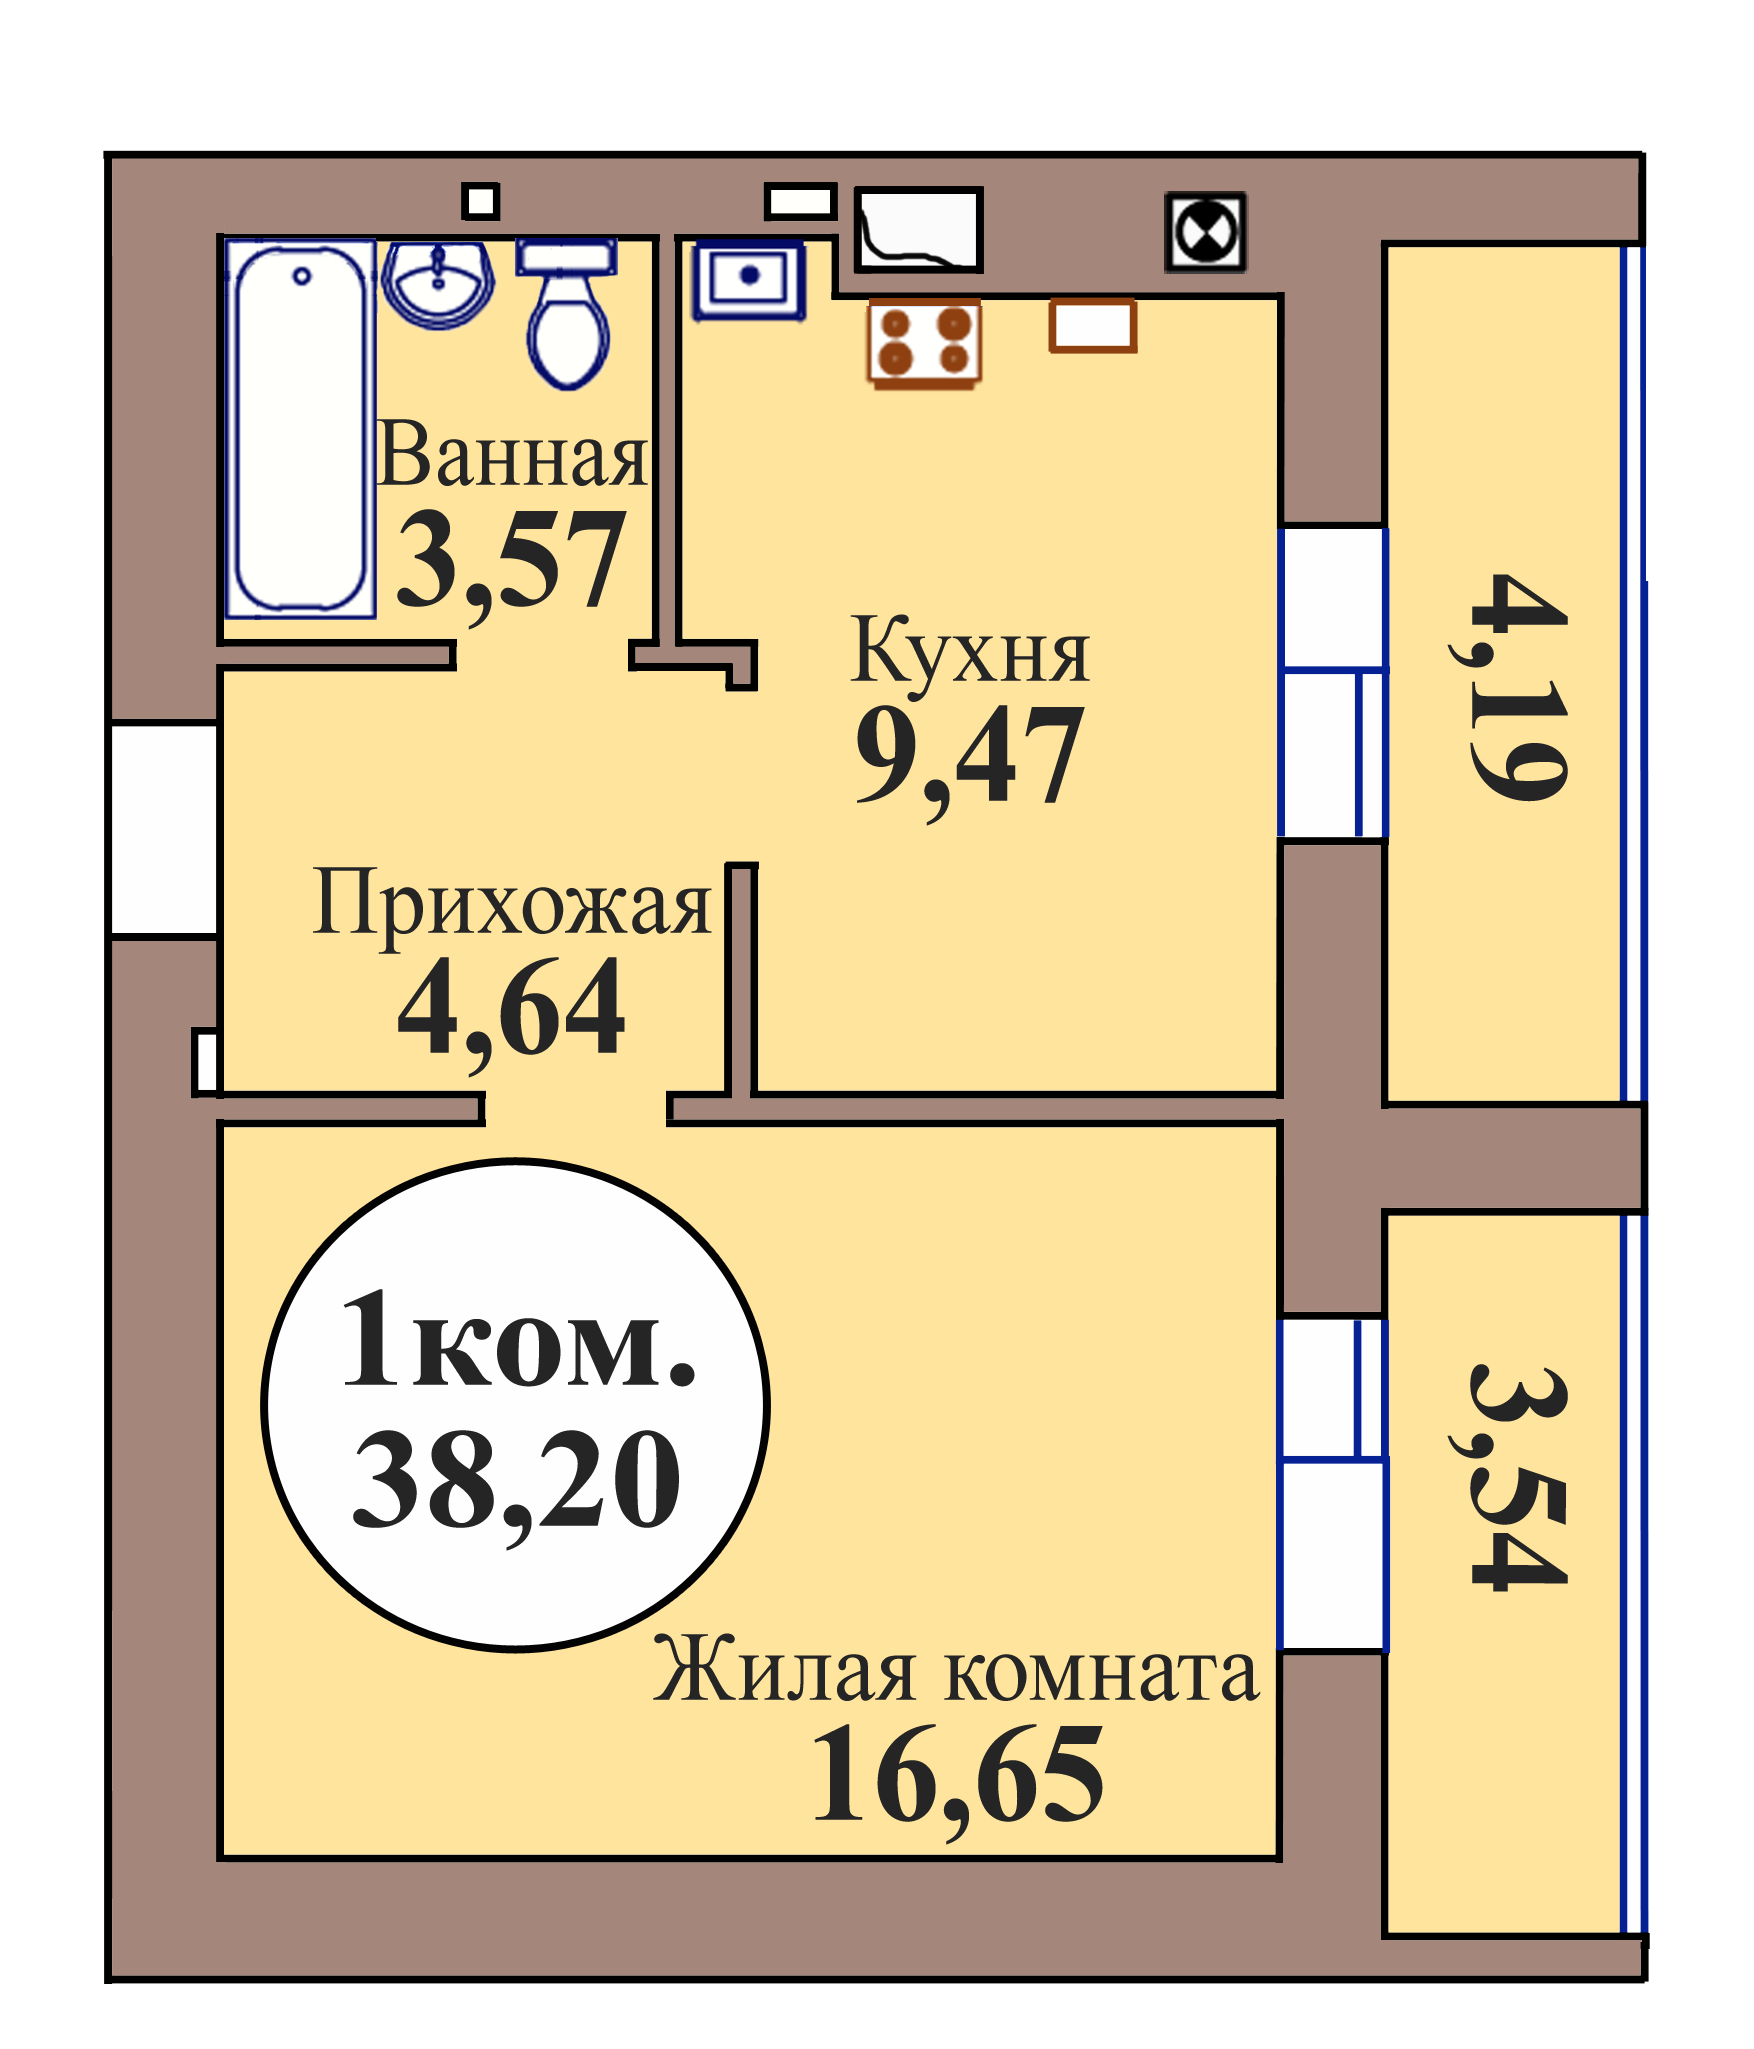 1-комн. кв. по ГП дом №3, МКР Васильково, кв. 49 в Калининграде